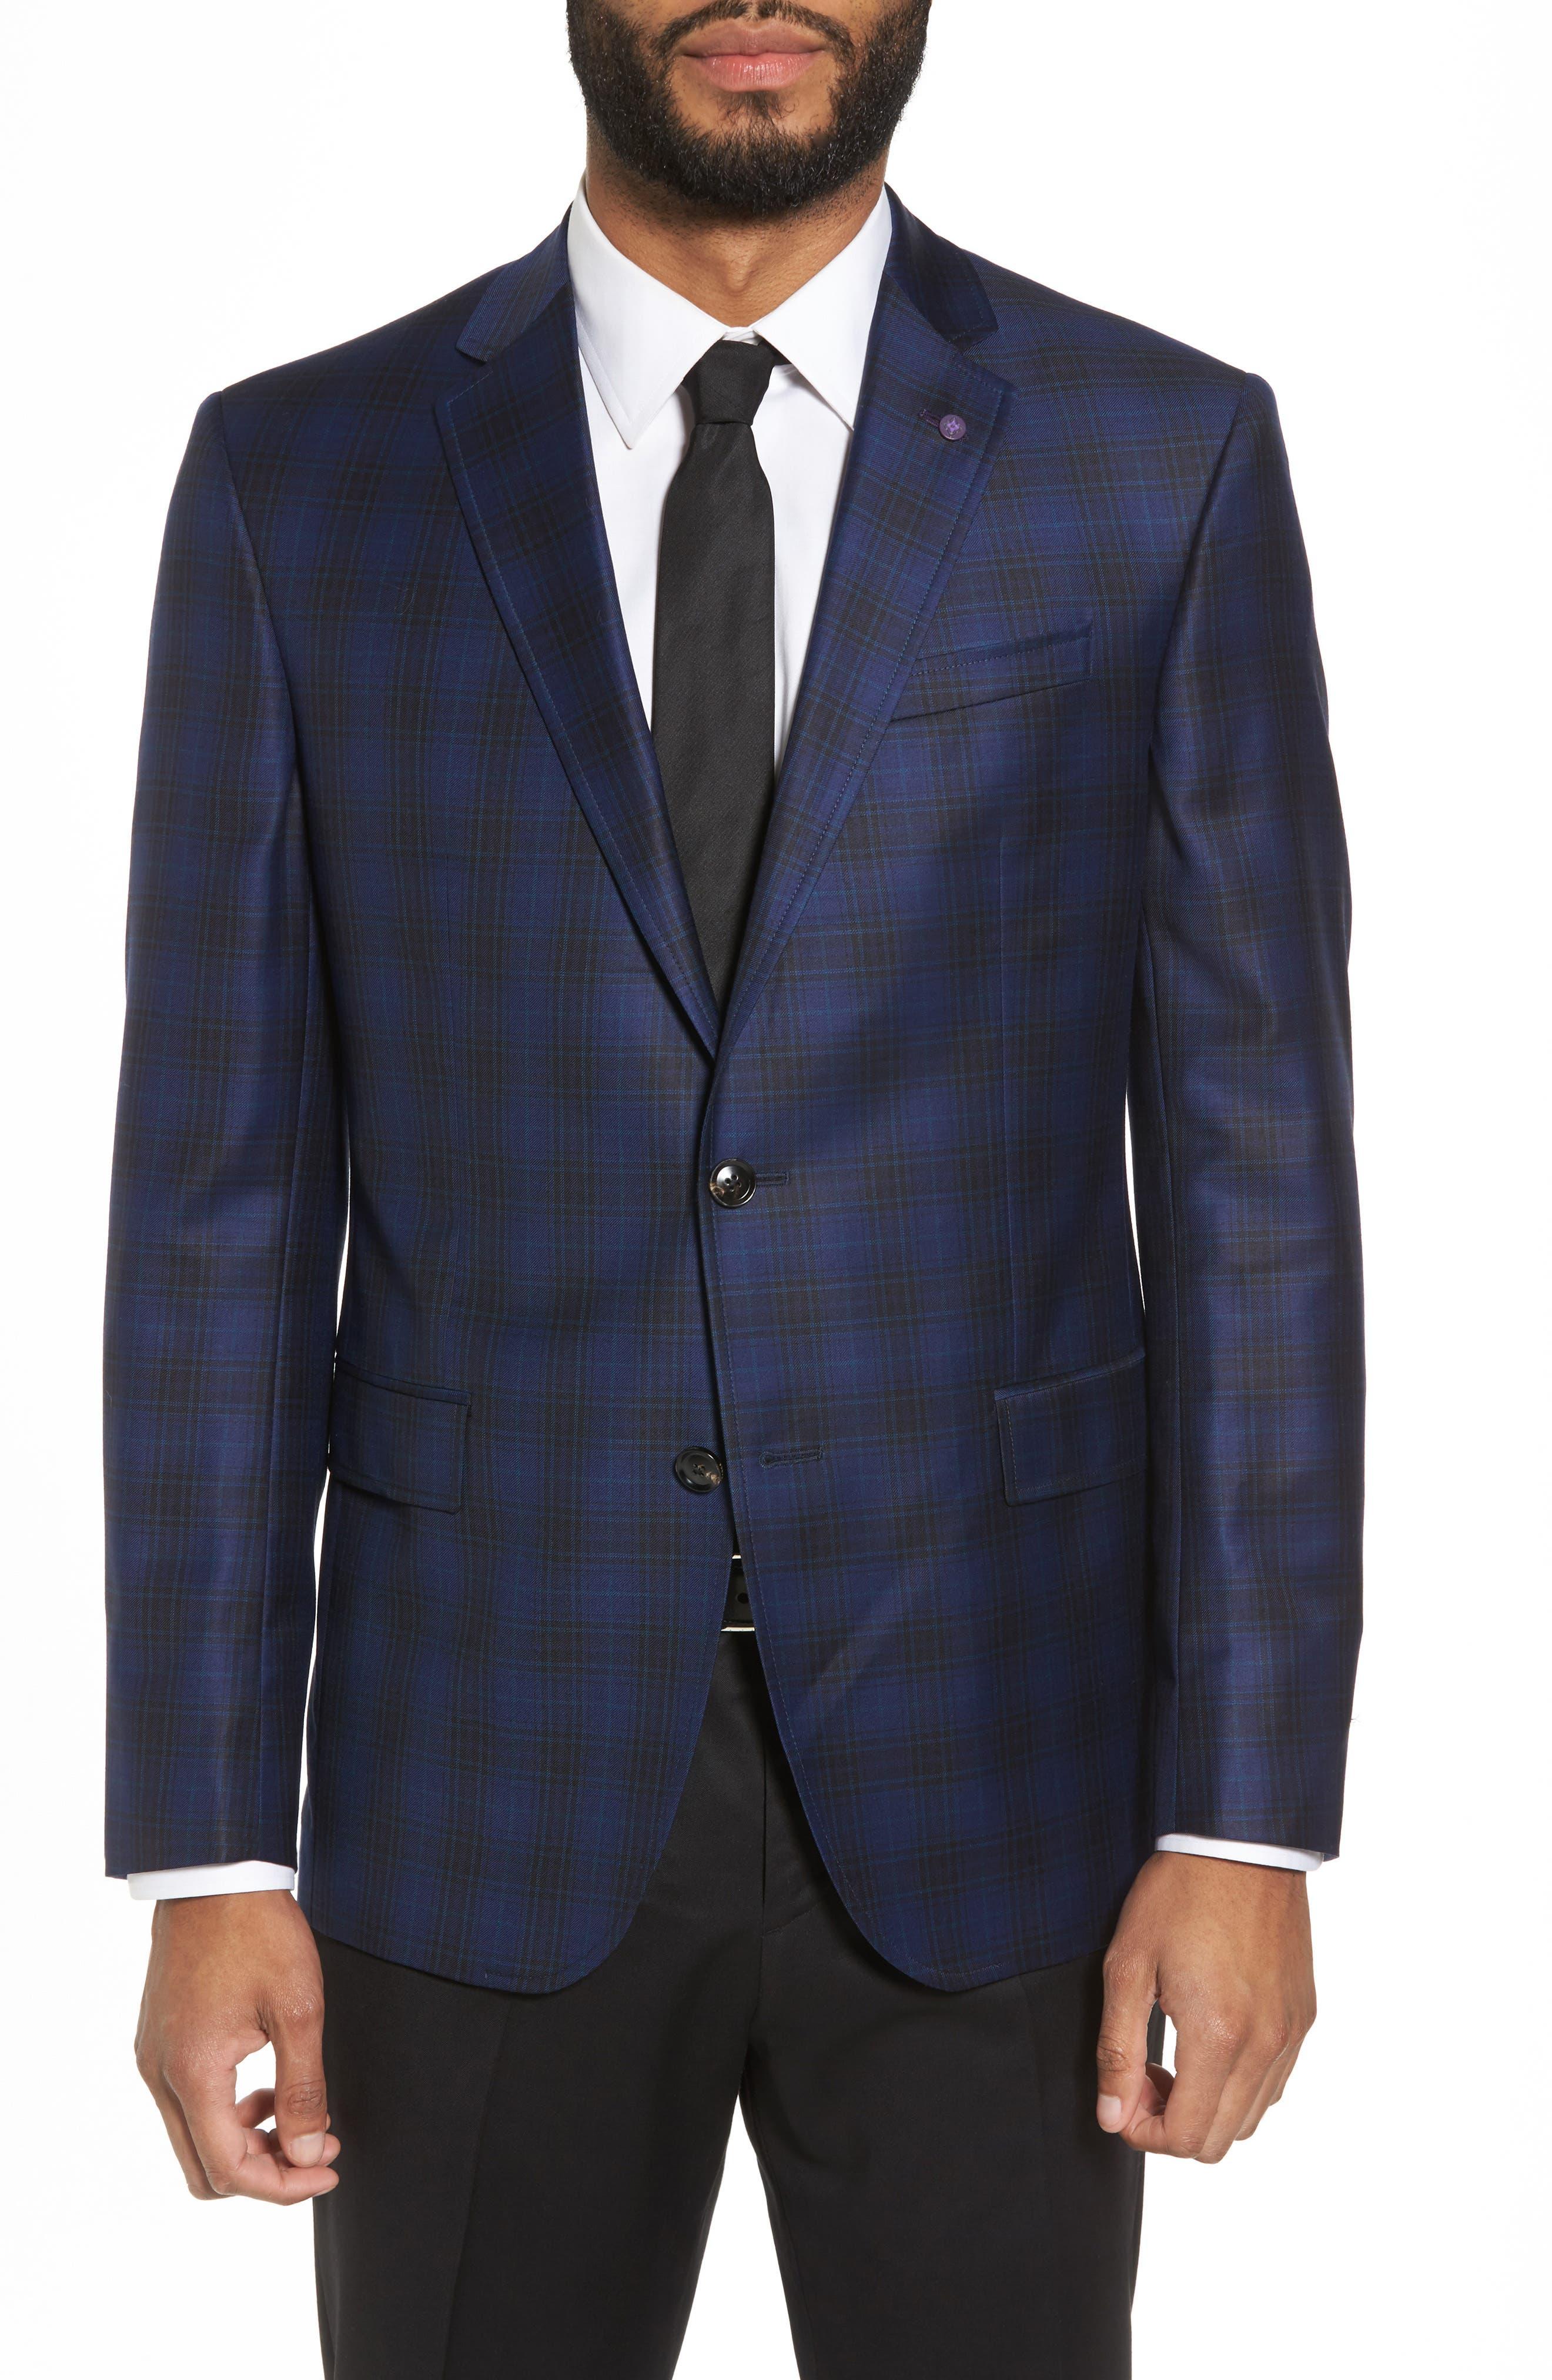 Jay Trim Fit Plaid Wool Sport Coat,                             Main thumbnail 1, color,                             Navy